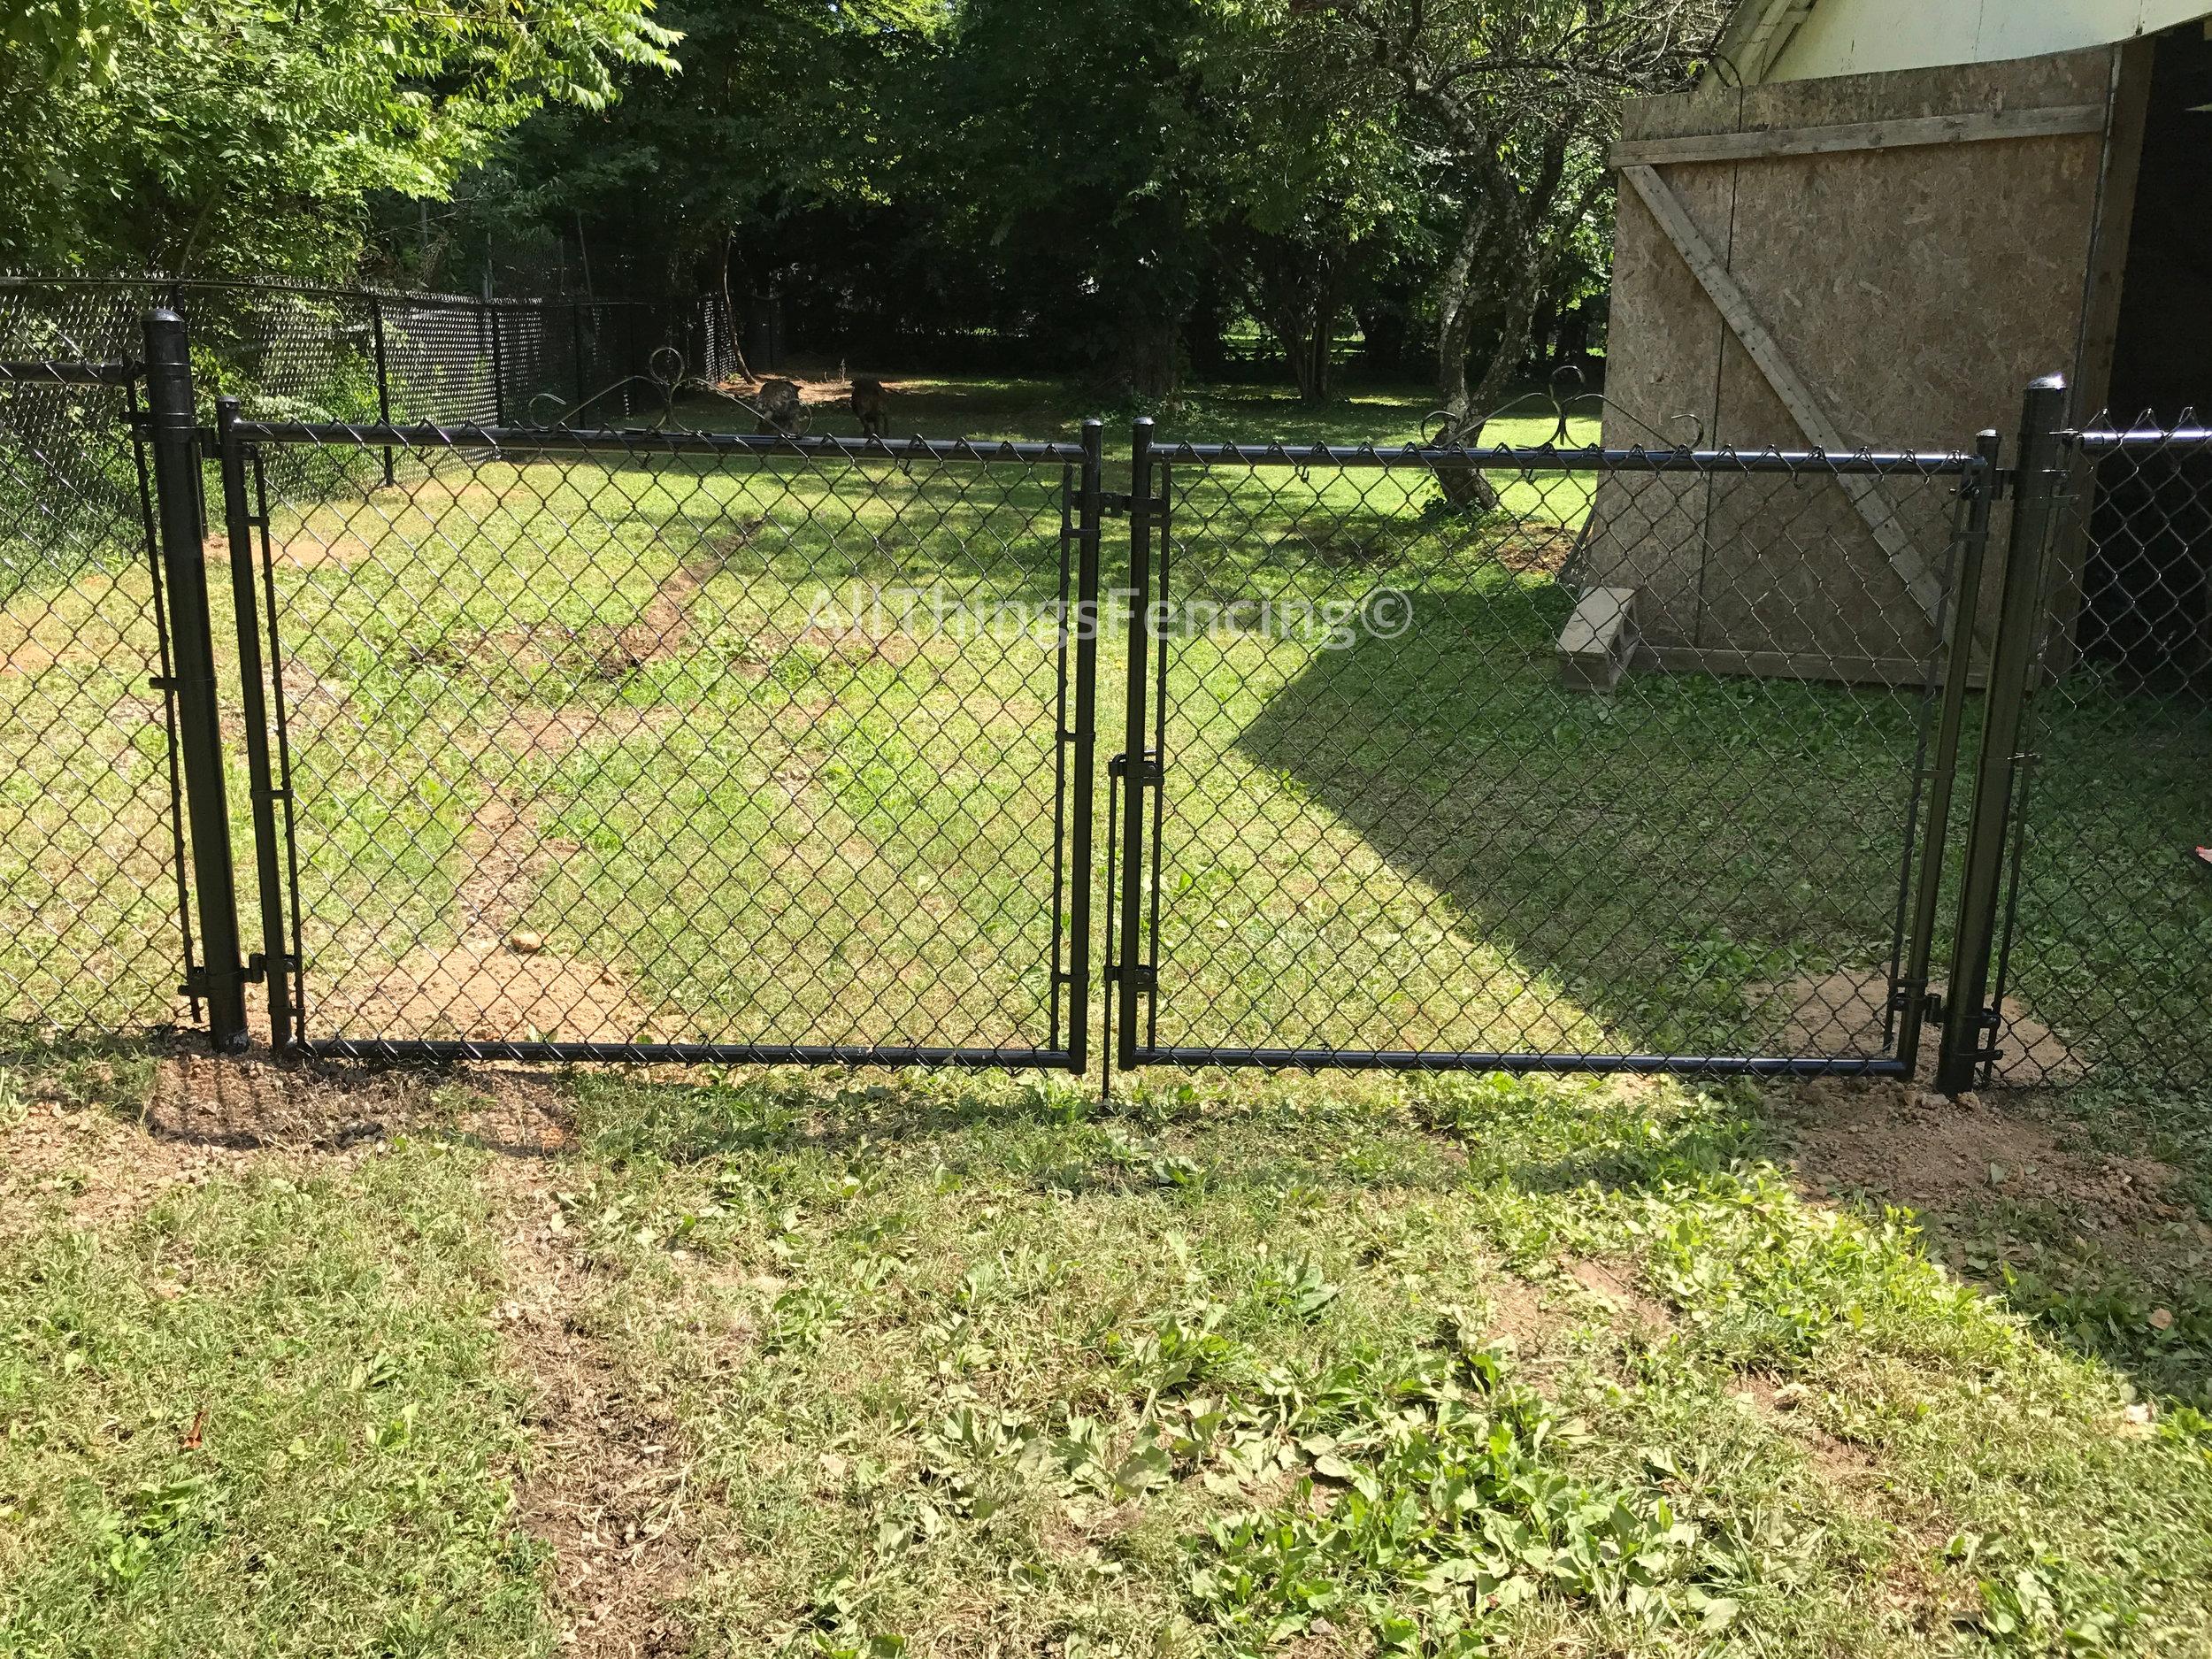 Fence10.jpg